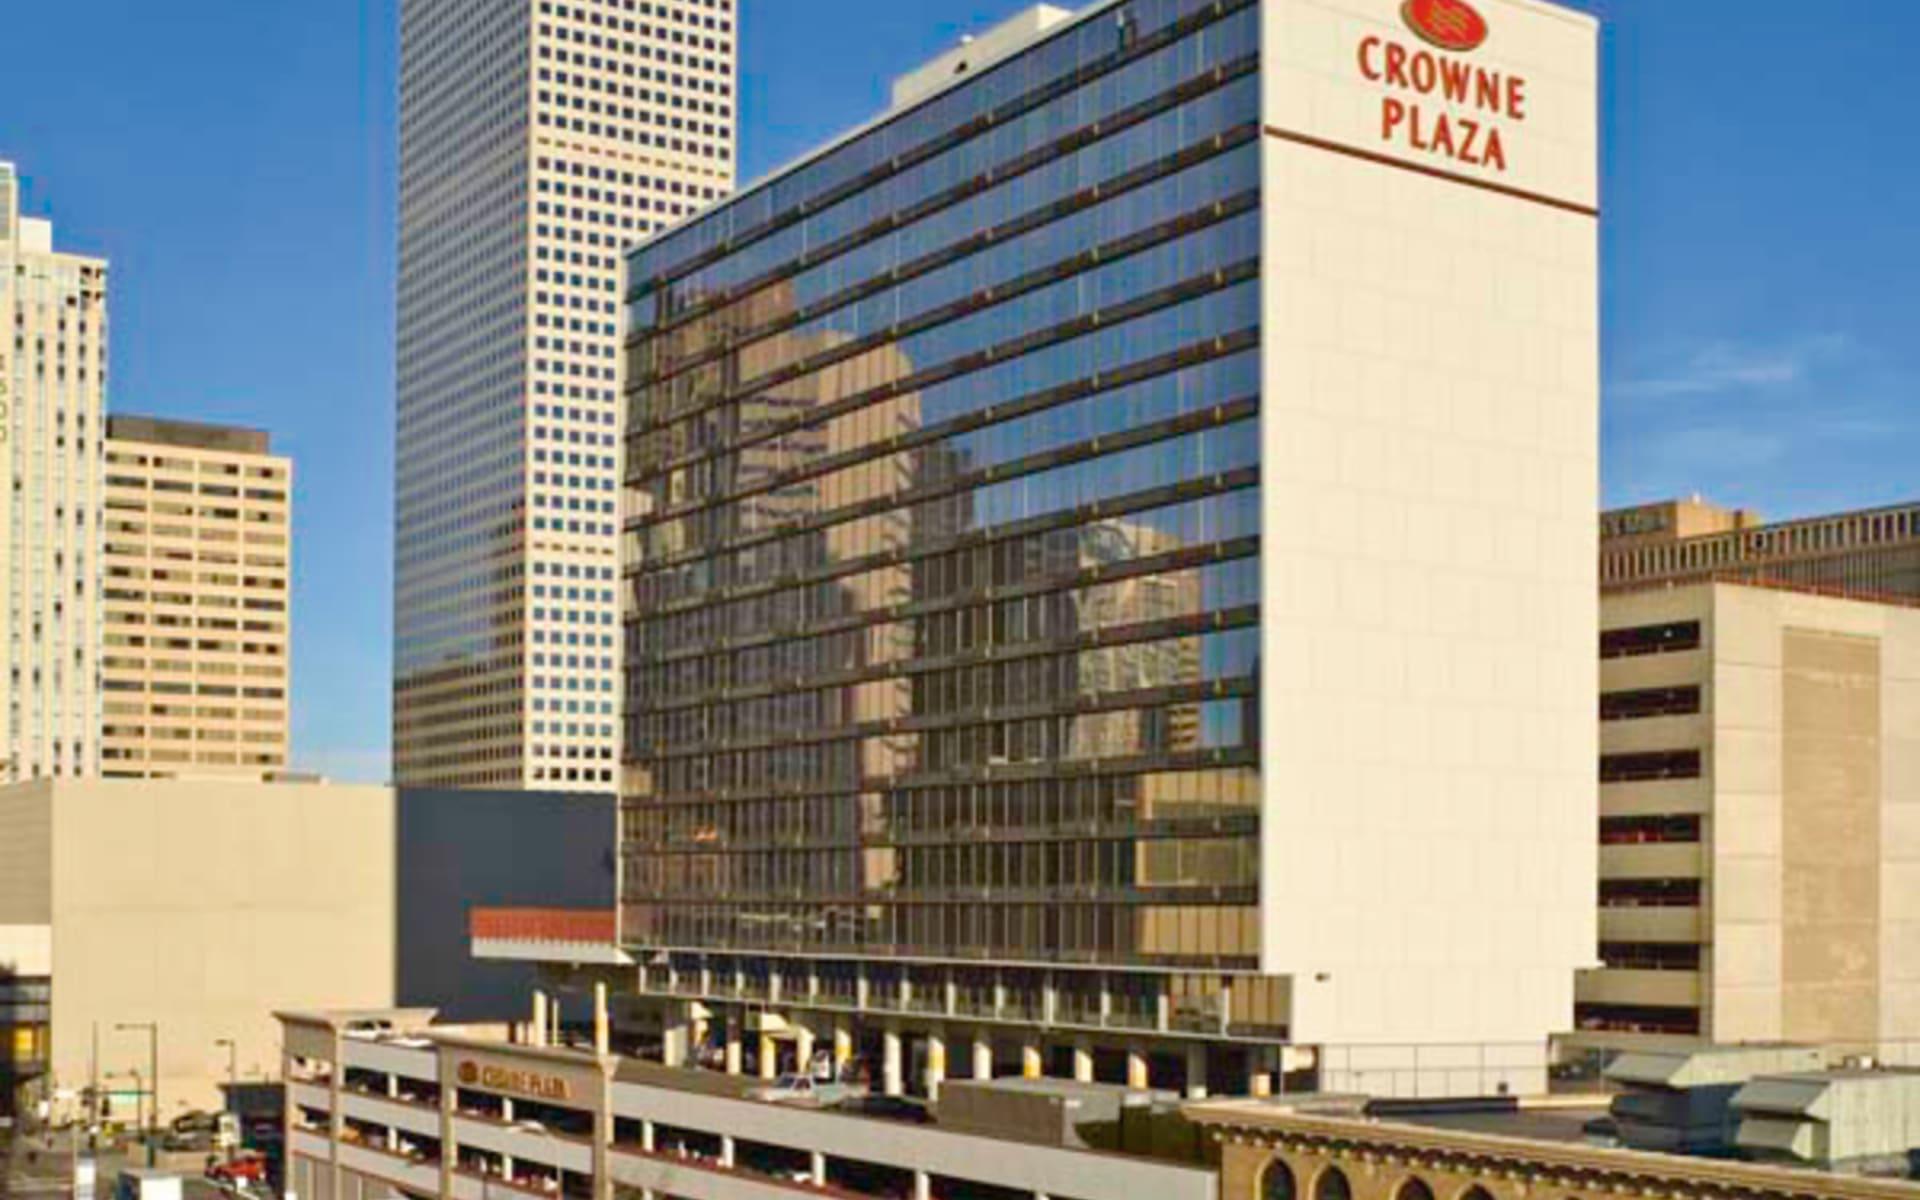 Crowne Plaza Denver Downtown: exterior crowne plaza denver hotelanicht strasse